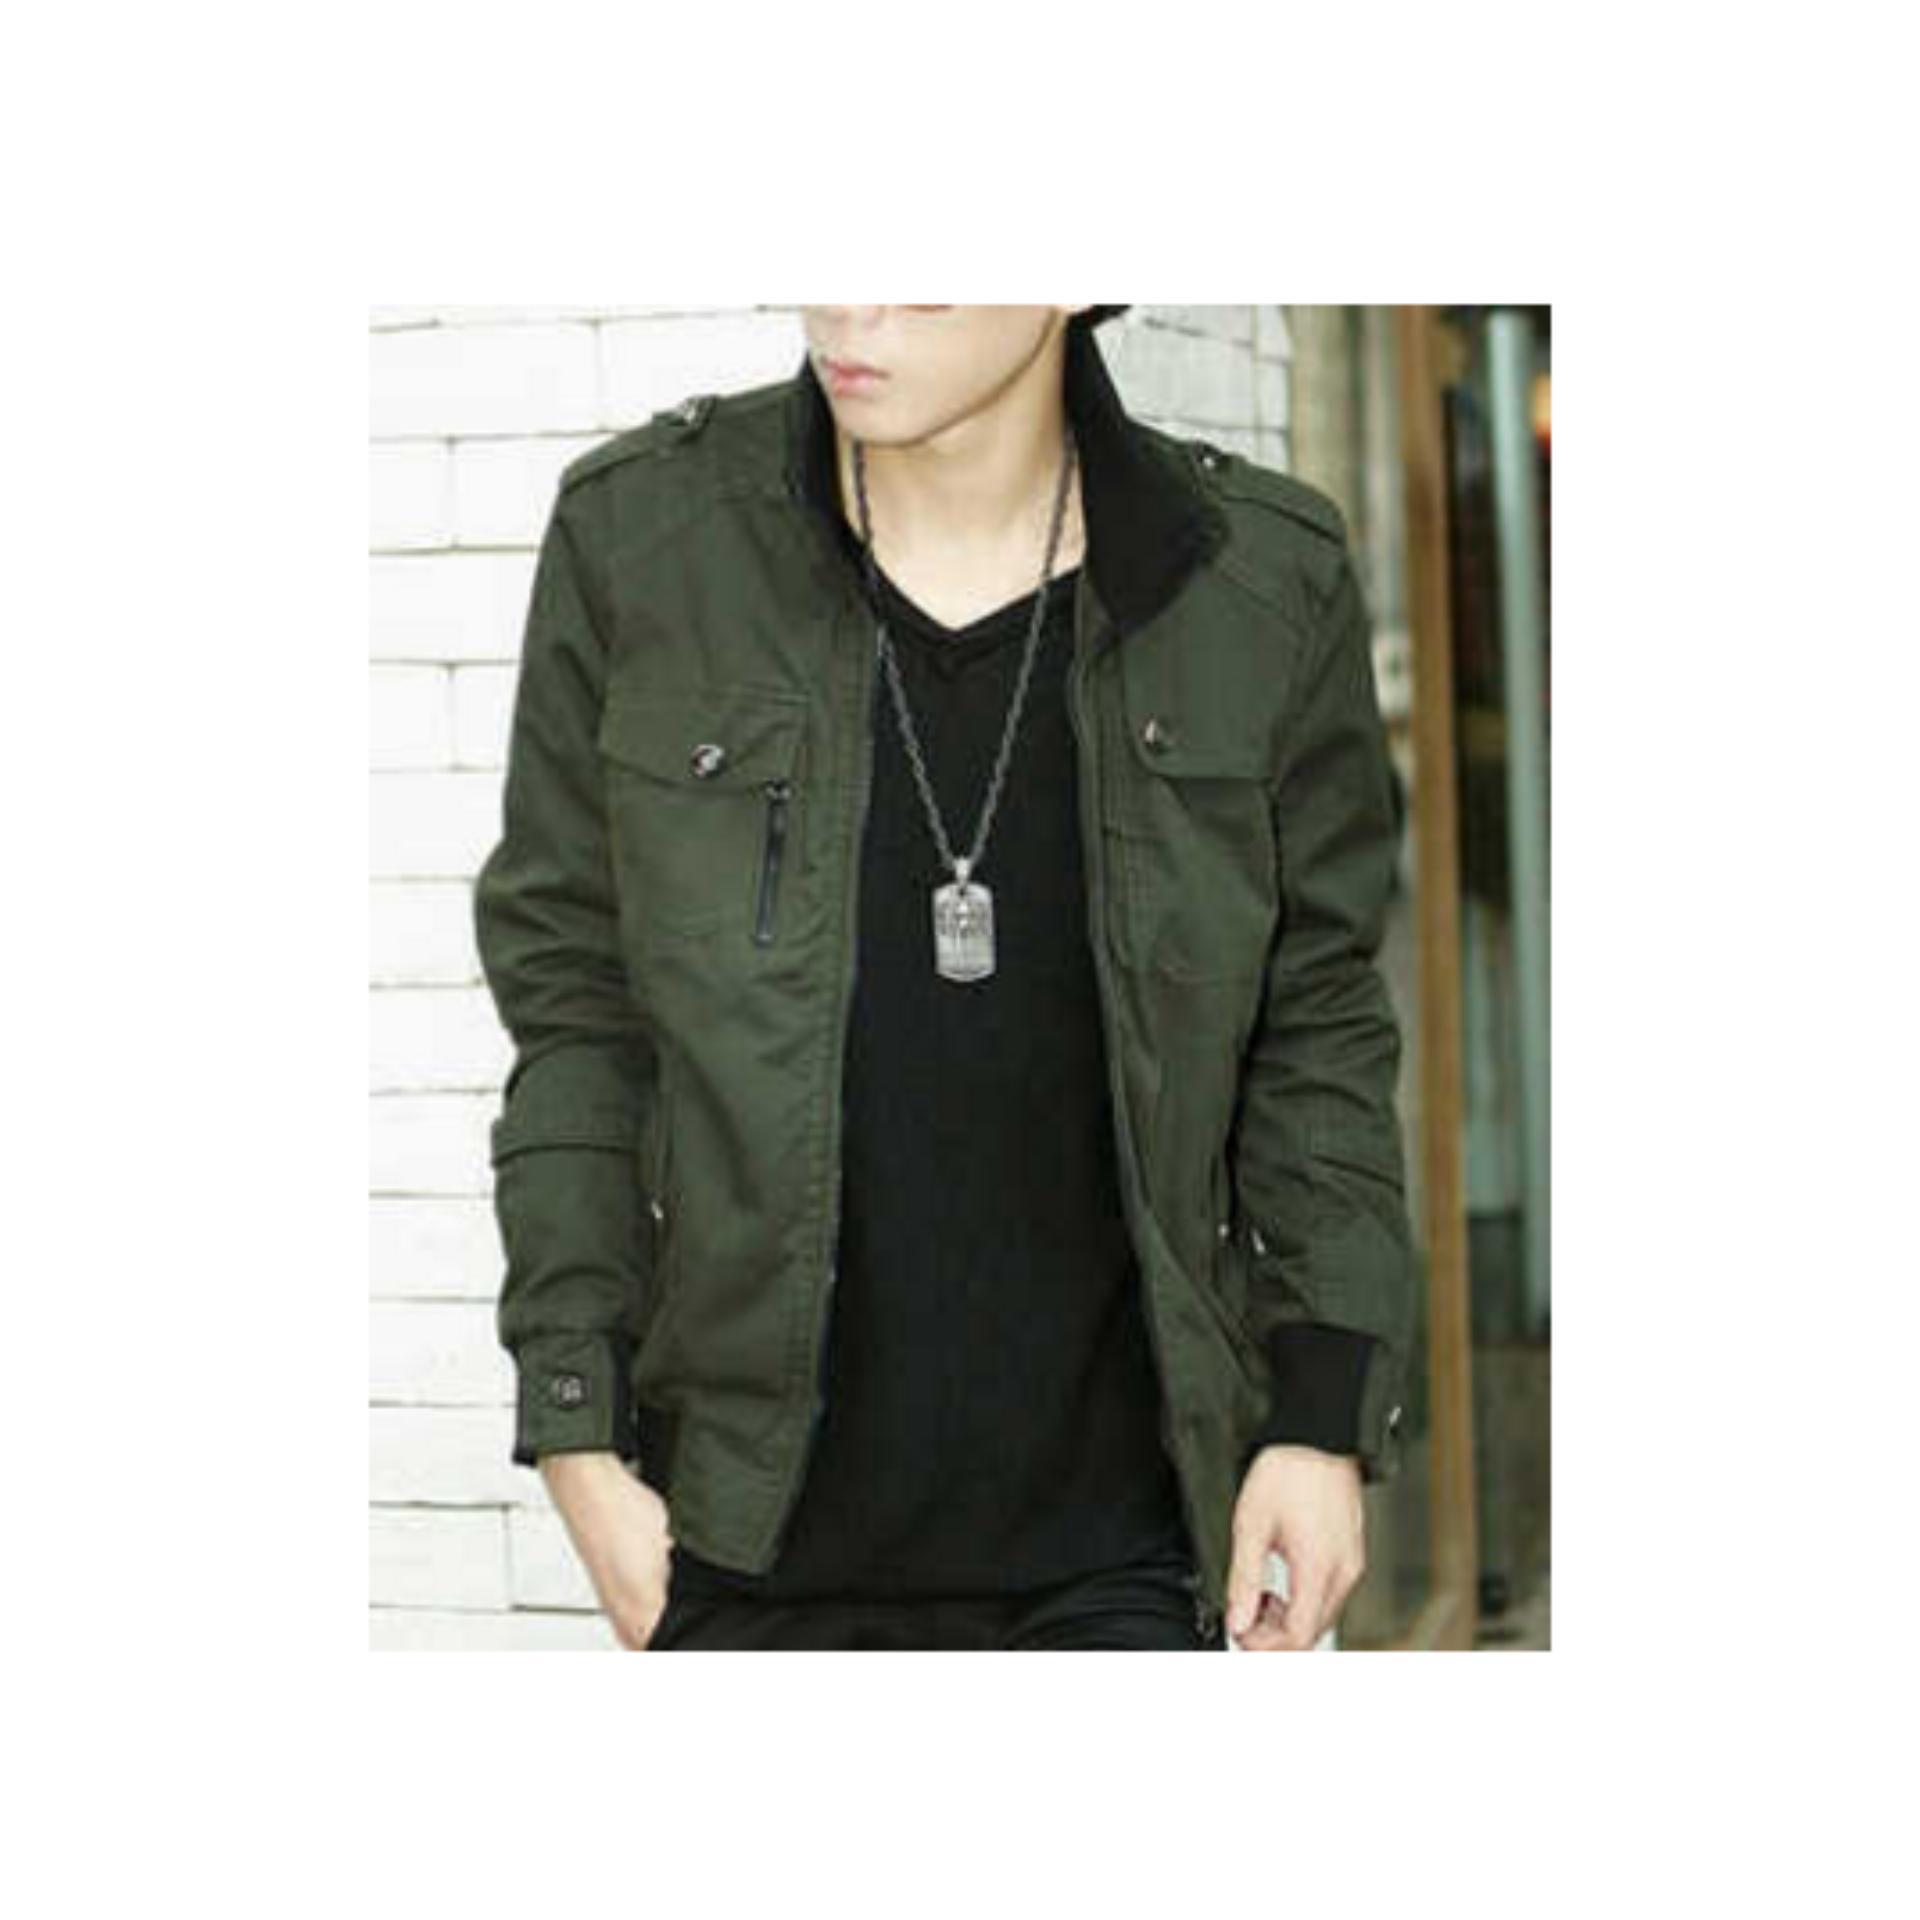 Pencari Harga Jaket Jacket Pria Cowok Korea Keren Modis Harga Baru 4fbc89af86